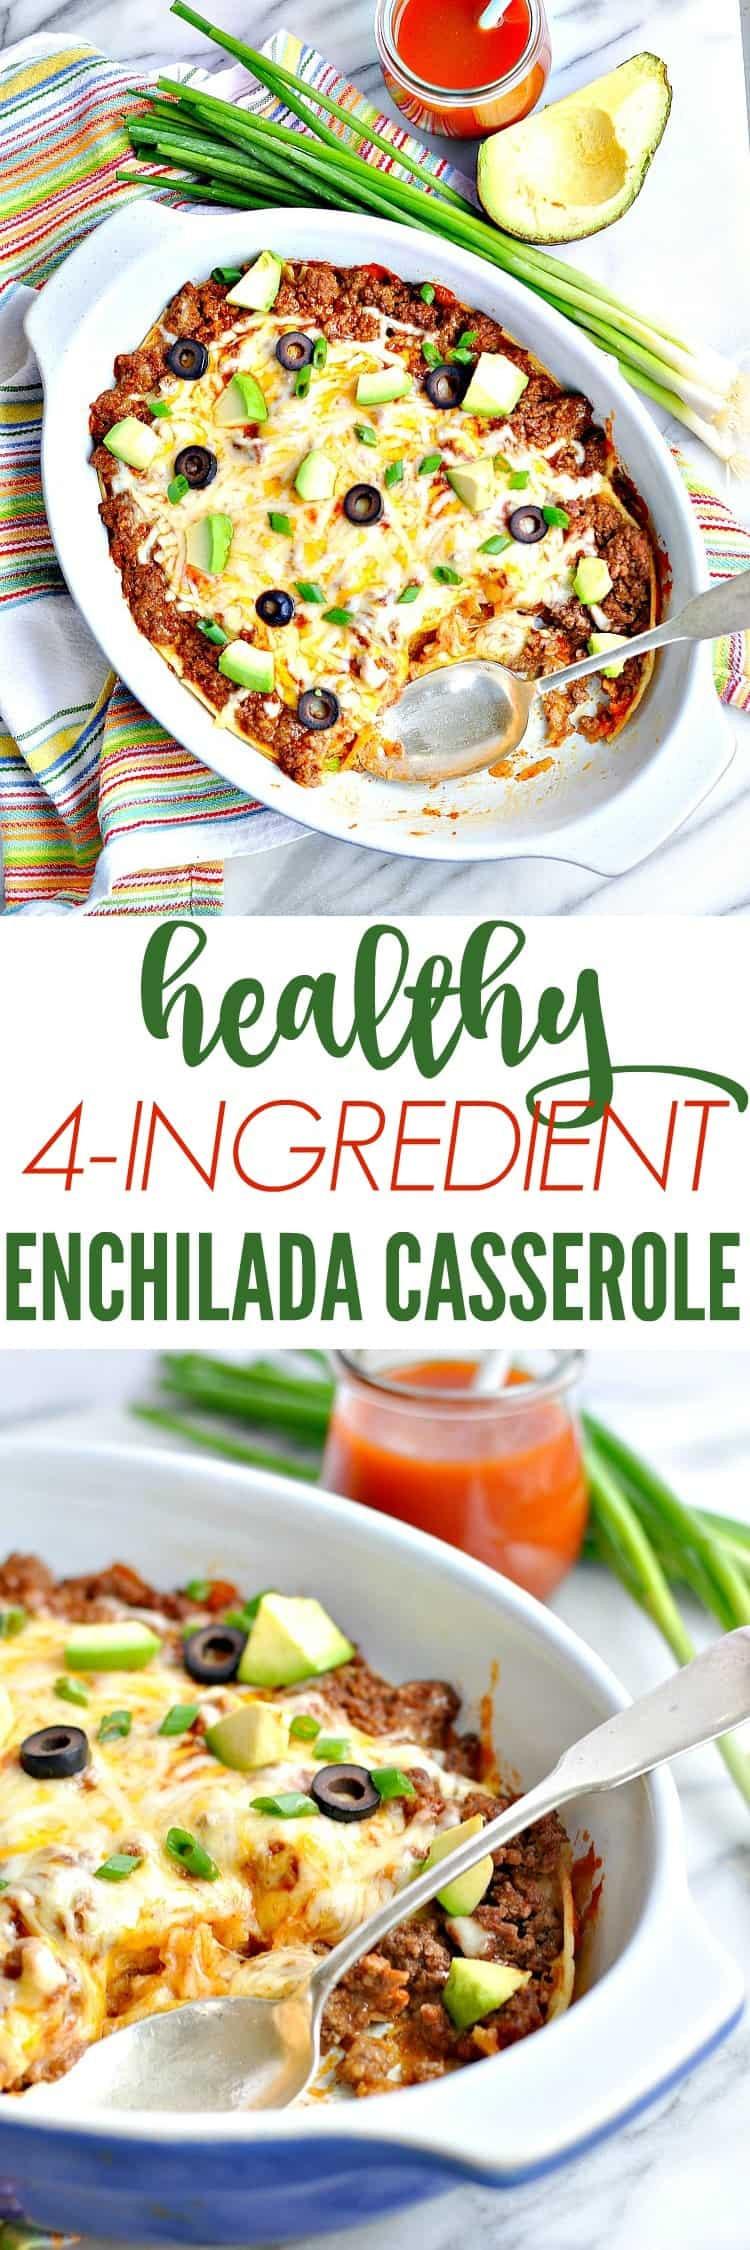 Quick Healthy Casseroles  Healthy 4 Ingre nt Enchilada Casserole The Seasoned Mom